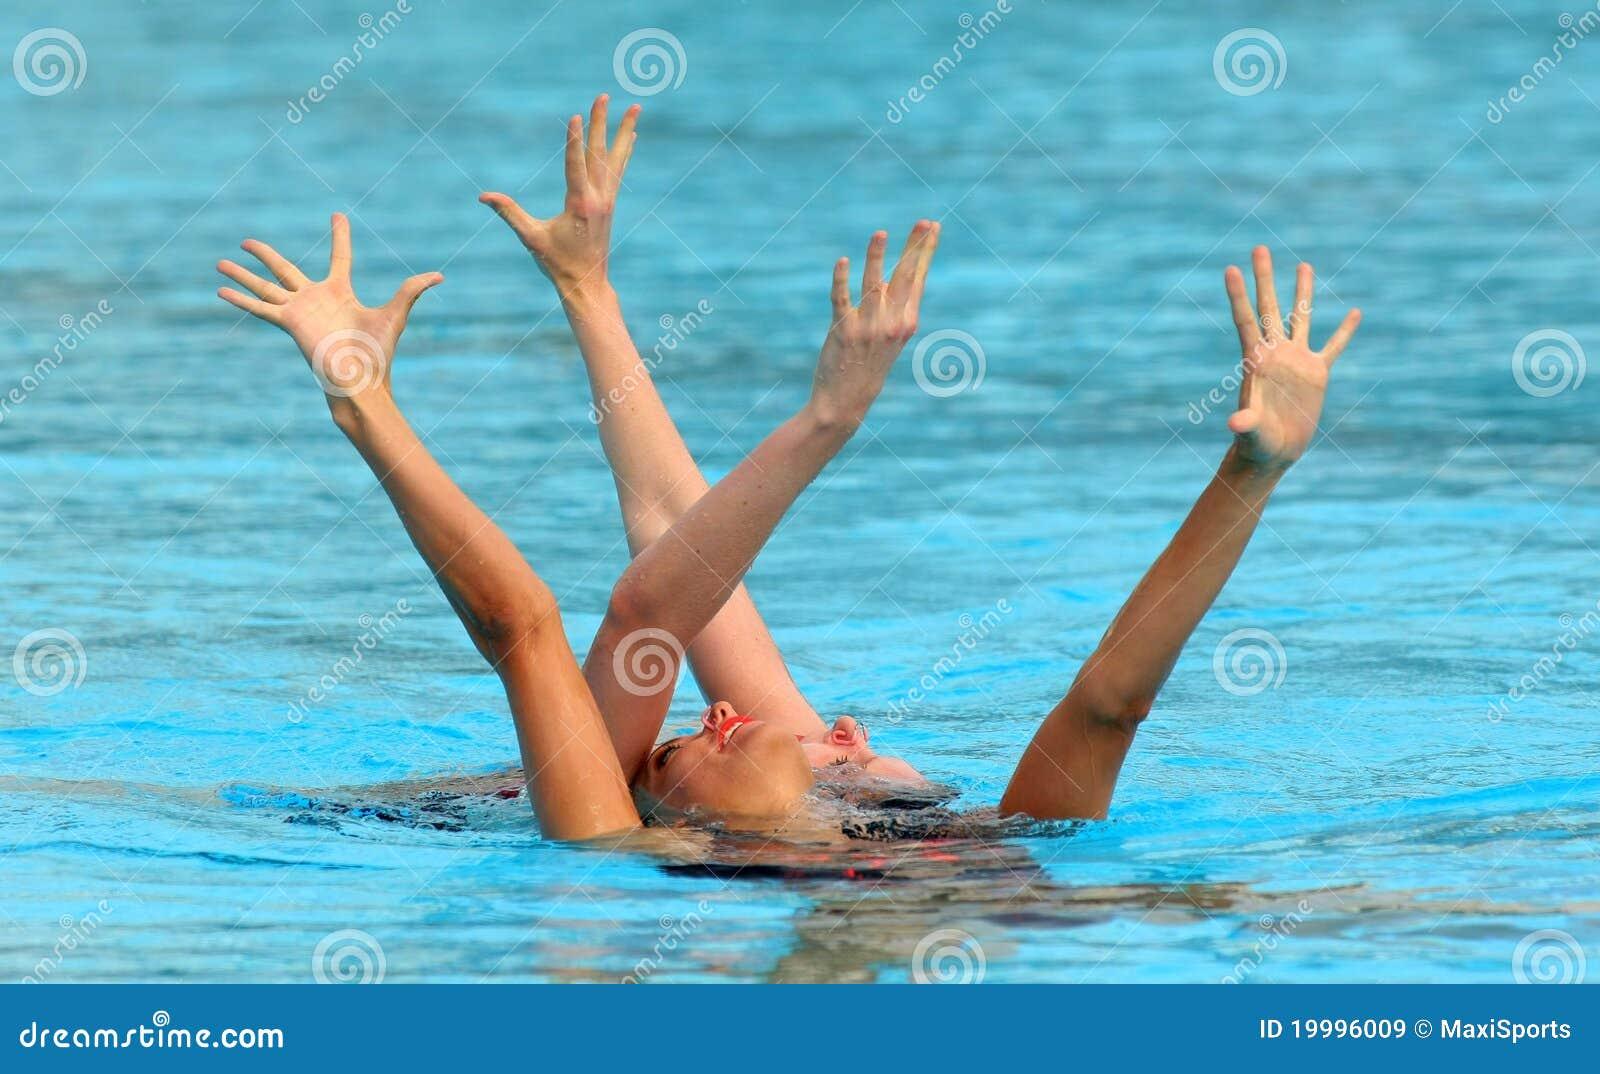 British synchro swimmers